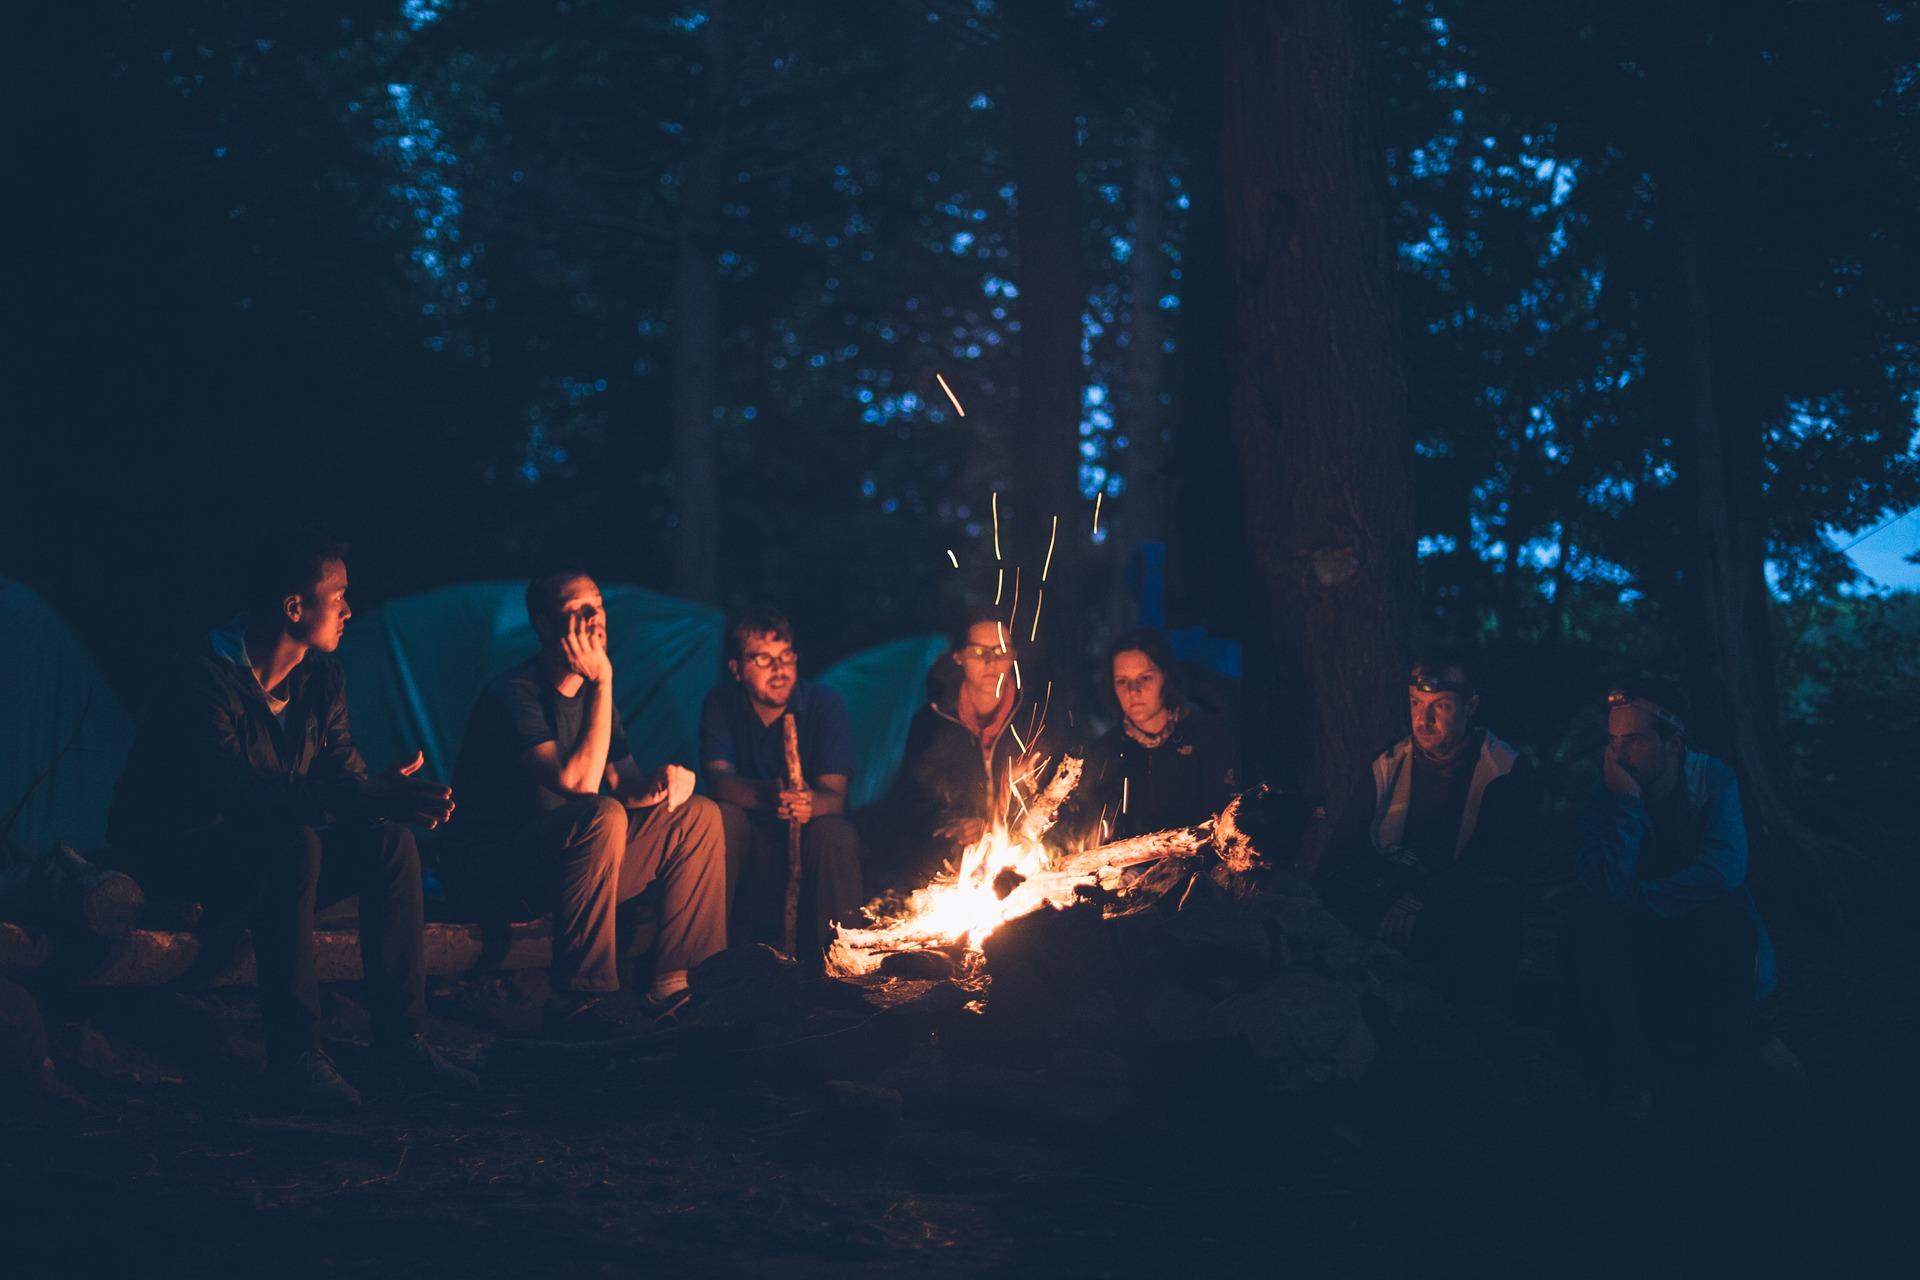 Campfire image courtesy of  Pexels at Pixabay